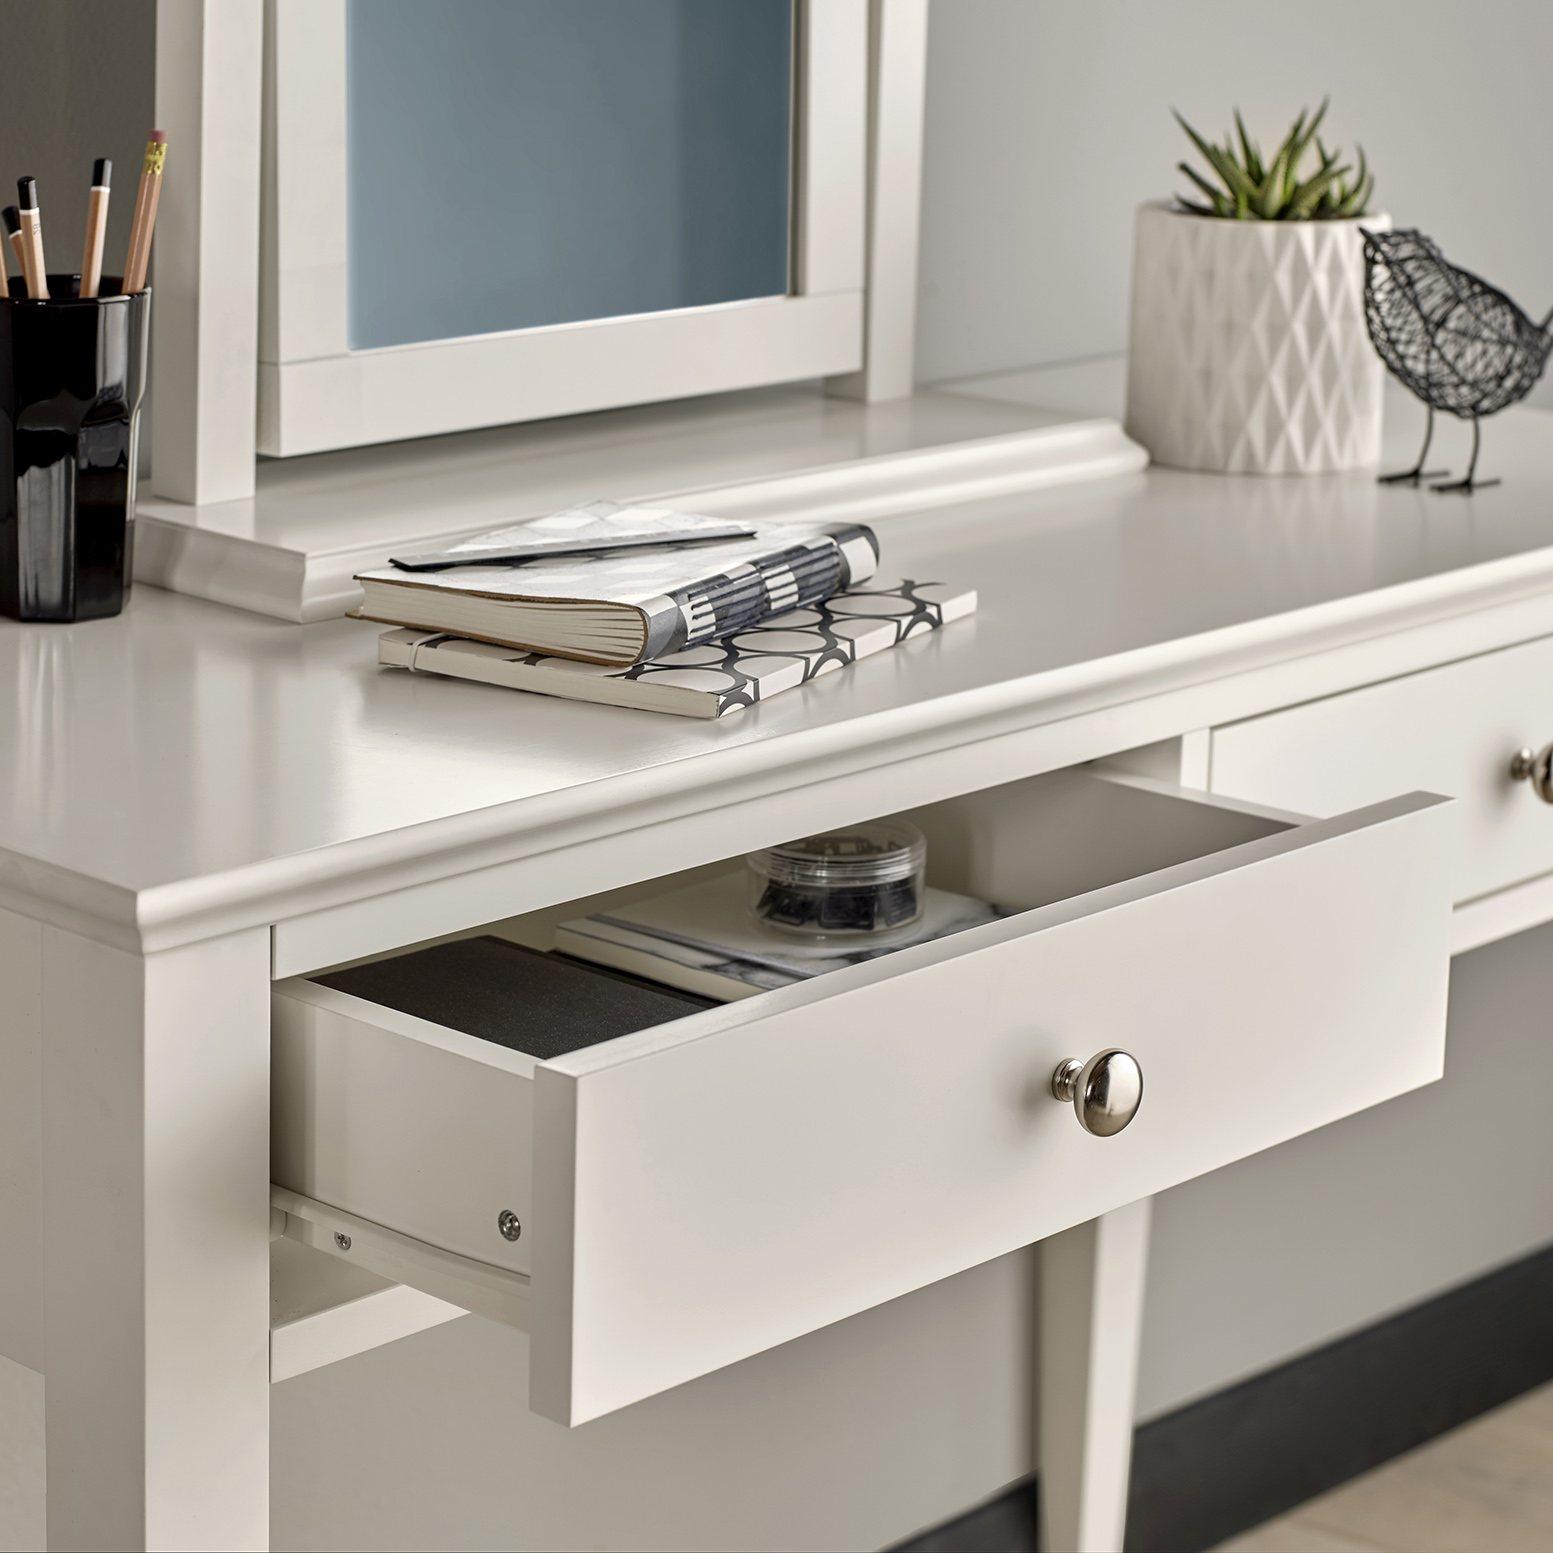 ASHLEY (GREY or WHITE) DRESSING TABLE - DRAWER DETAIL